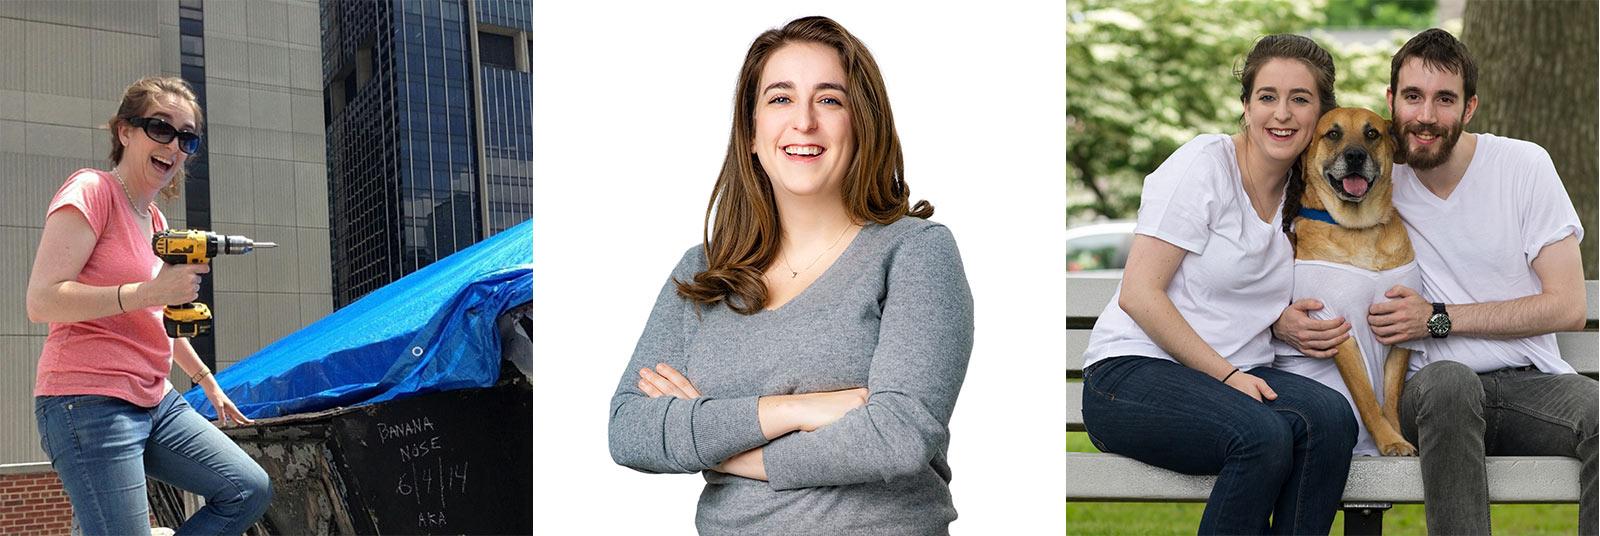 Laura Goodman PE Project Manager Staff Spotlight Collage 1